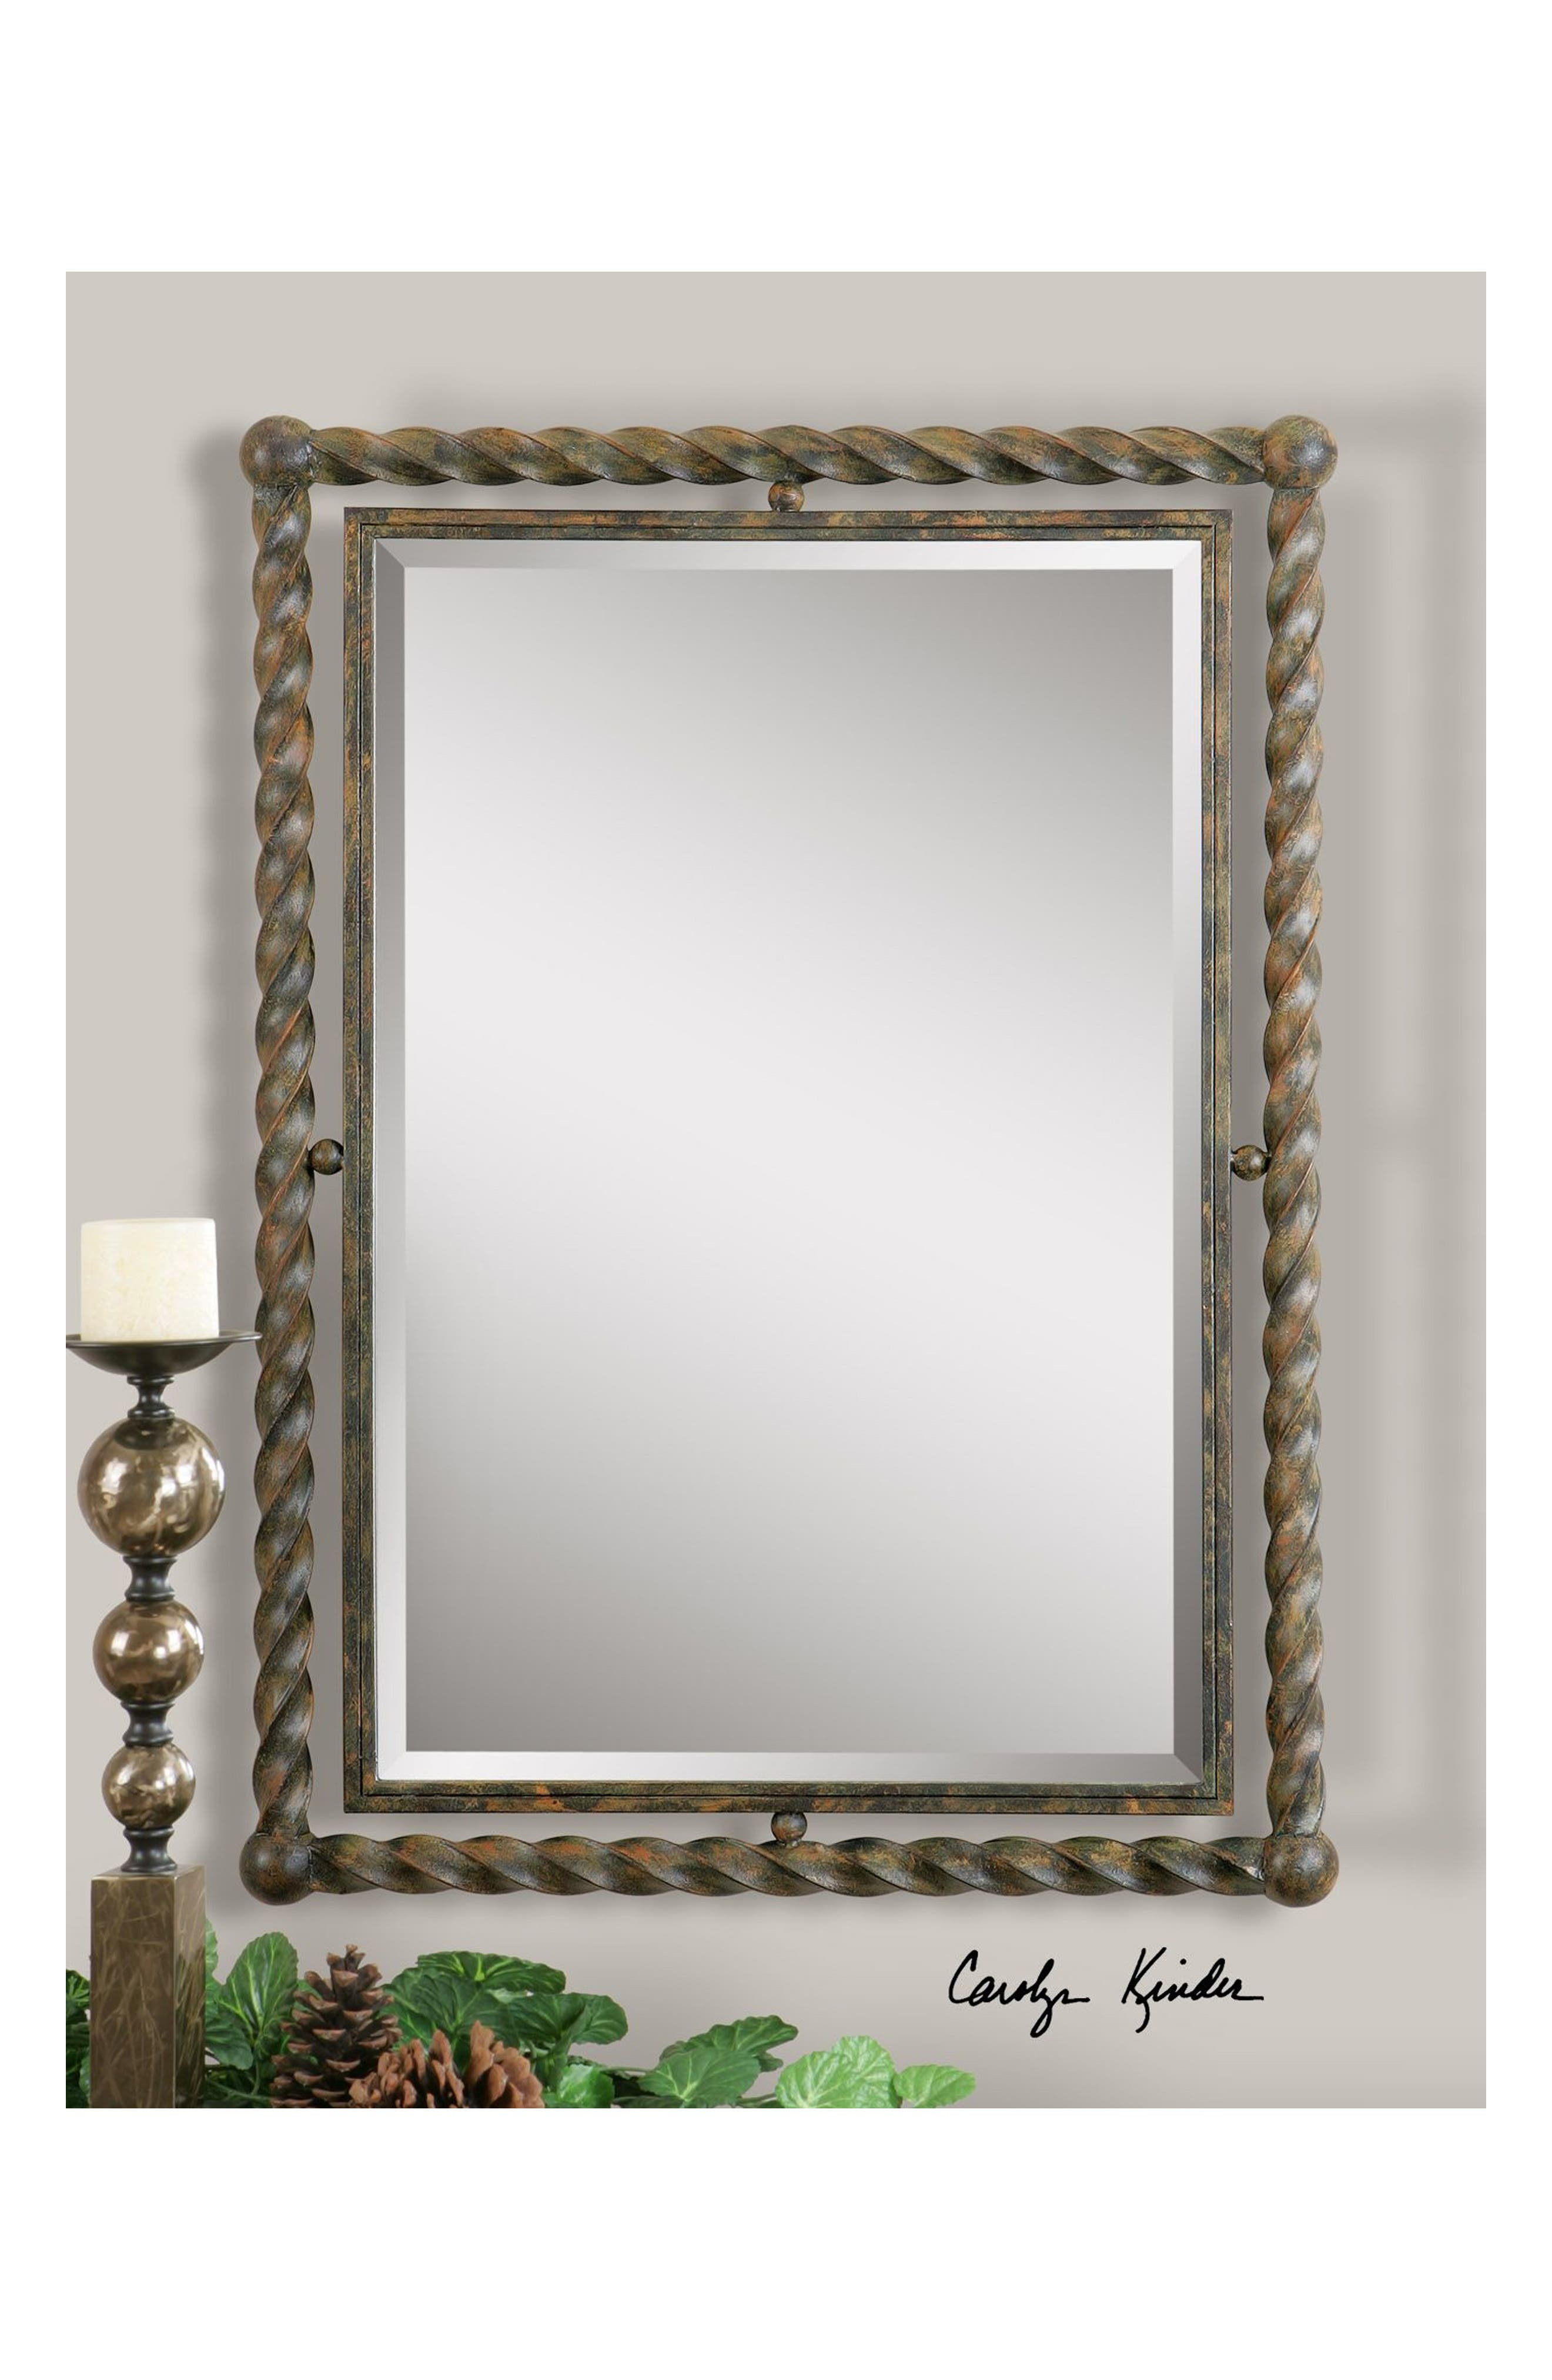 'Garrick' Wrought Iron Mirror,                             Alternate thumbnail 2, color,                             200